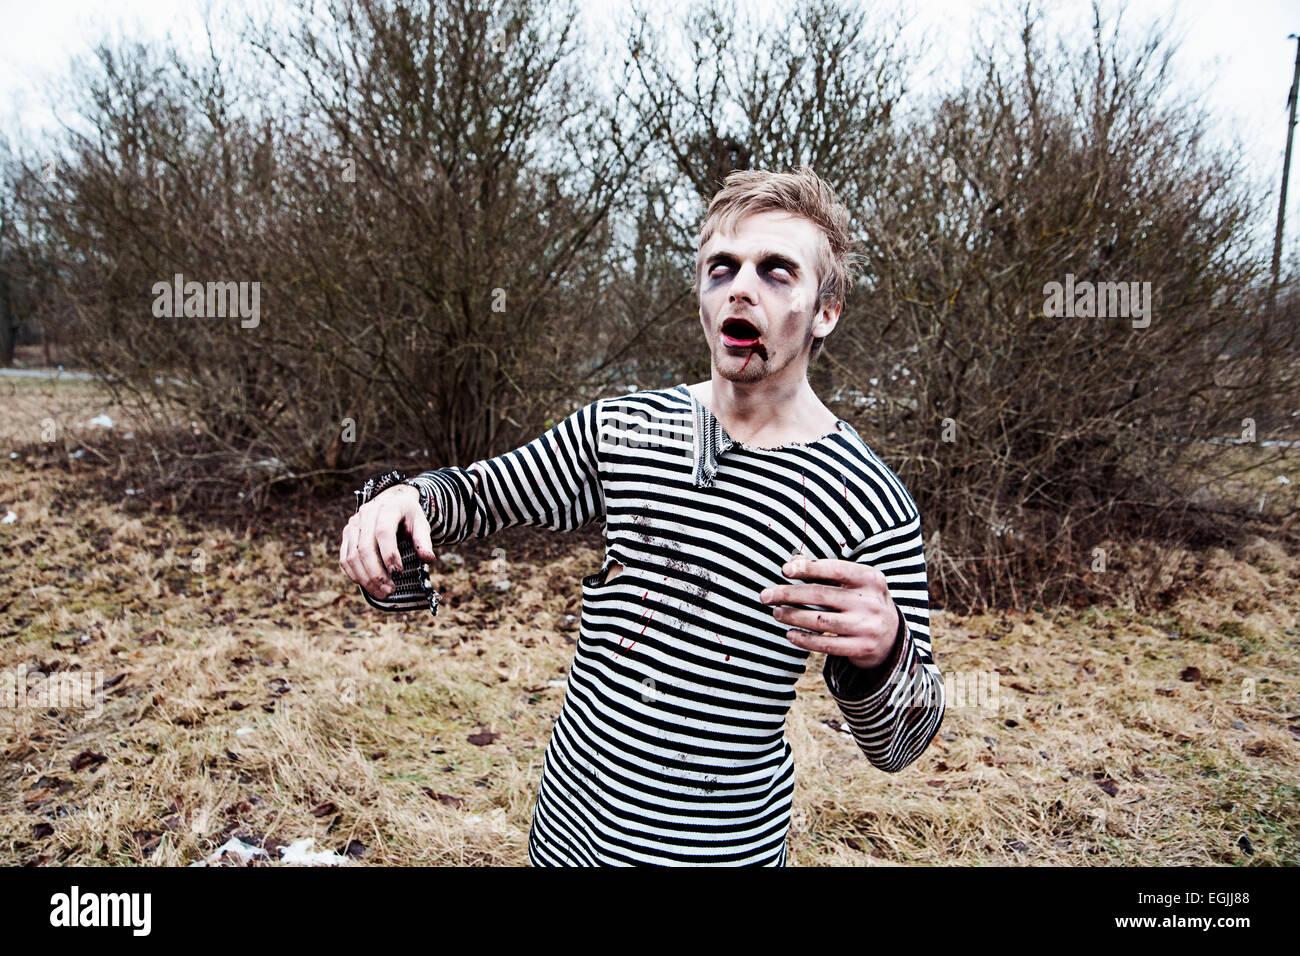 Gekleidet wie Seemann Mann gruselige zombie Stockbild